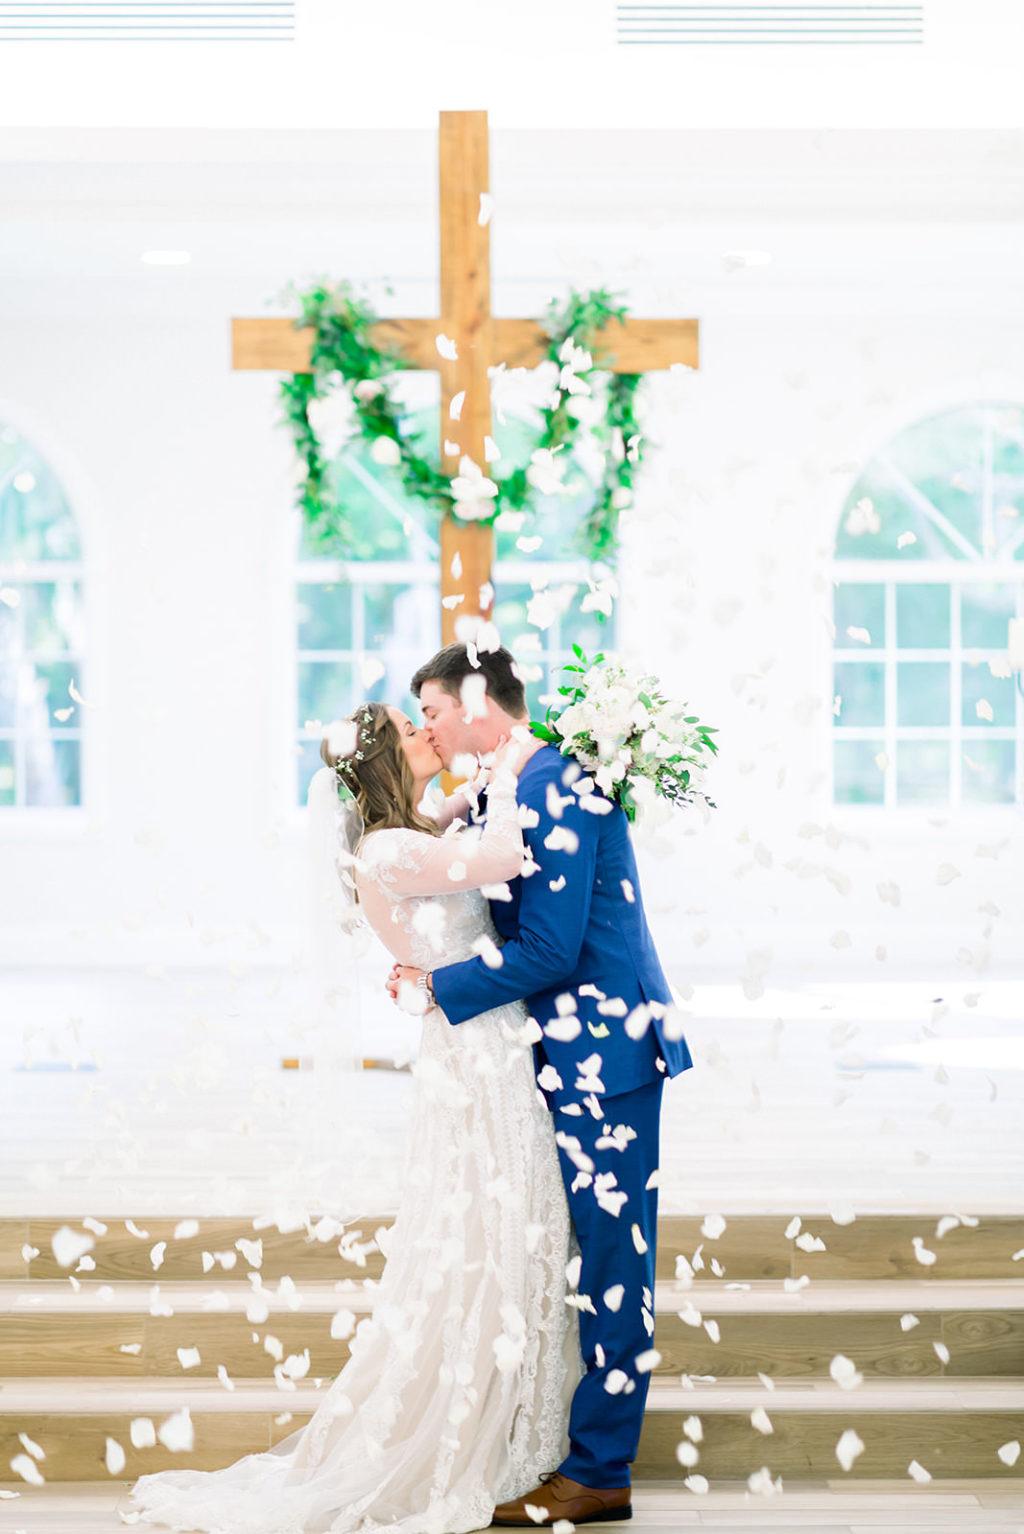 Florida Bride and Groom Intimate First Kiss Wedding Portrait | Tampa Bay Wedding Ceremony Venue Harborside Chapel | Tampa Bay Wedding Photographers Shauna and Jordon Photography